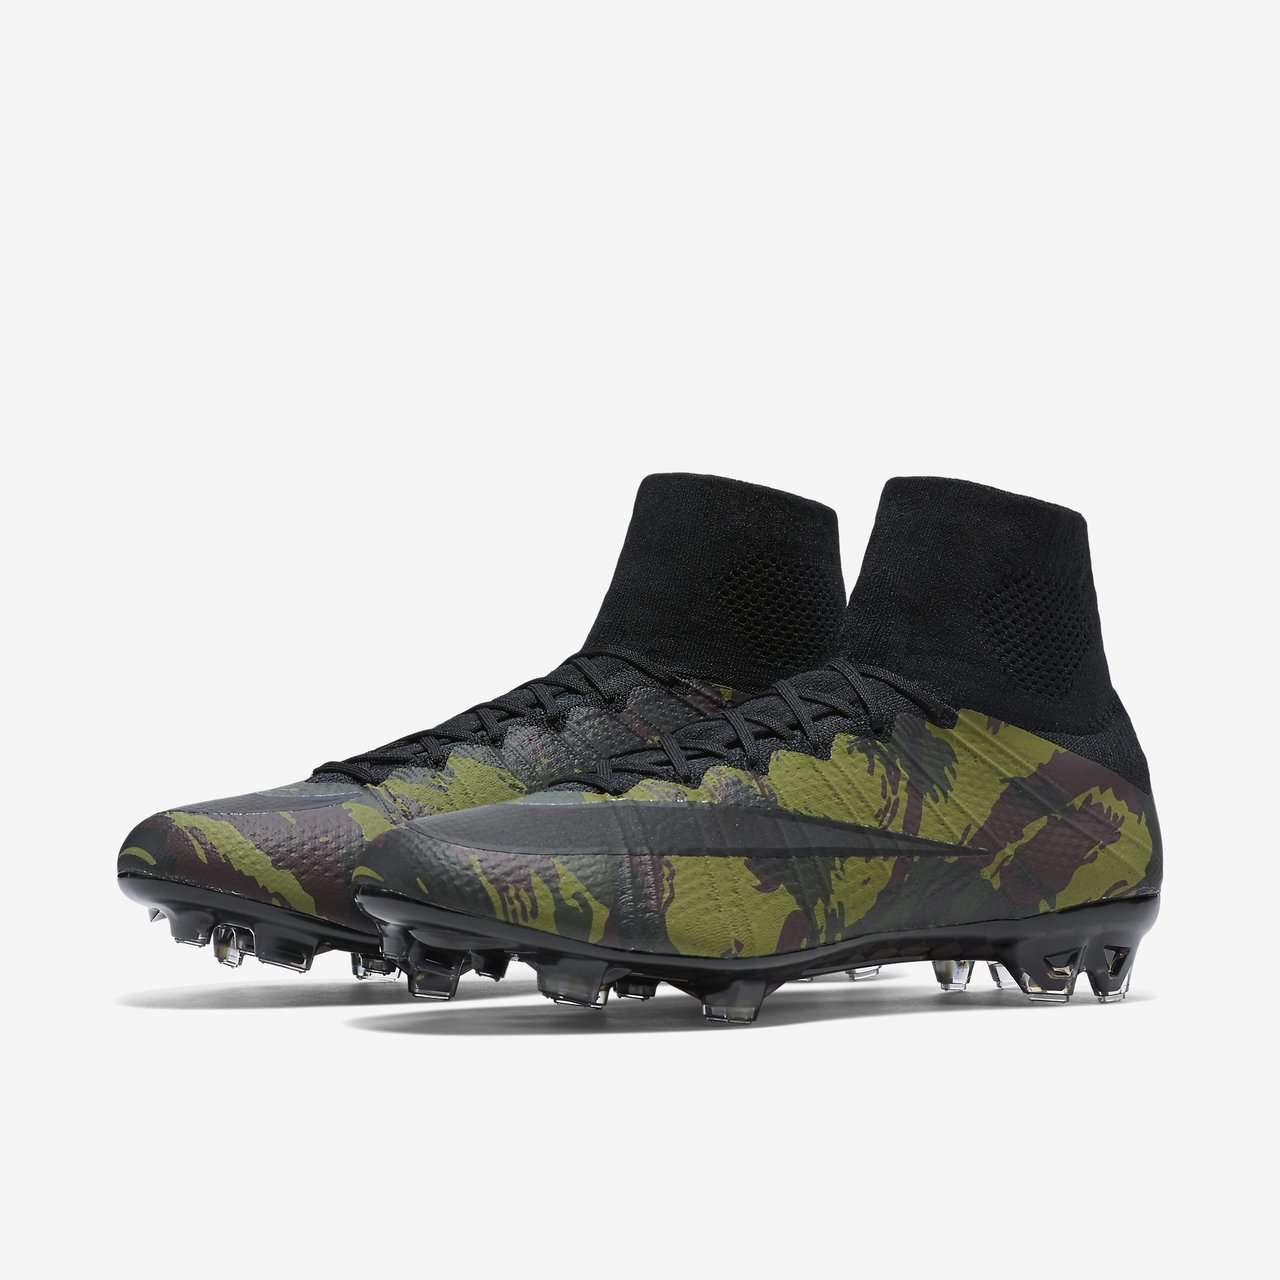 359514895af7 Nike Mercurial Superfly SE FG - Camo Pack - Alligator   Mahogany ...